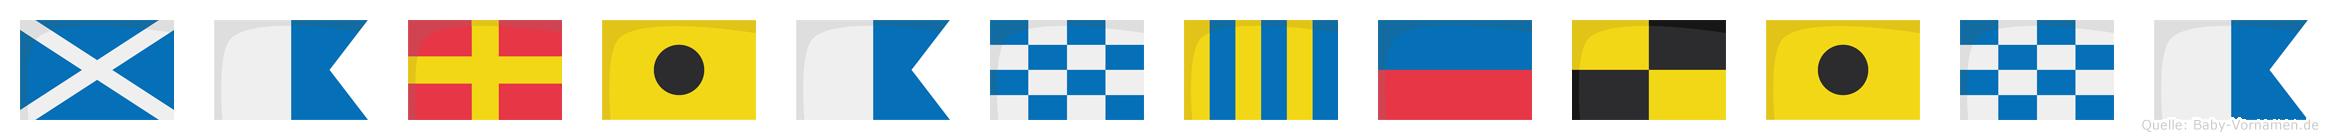 Mariangelina im Flaggenalphabet